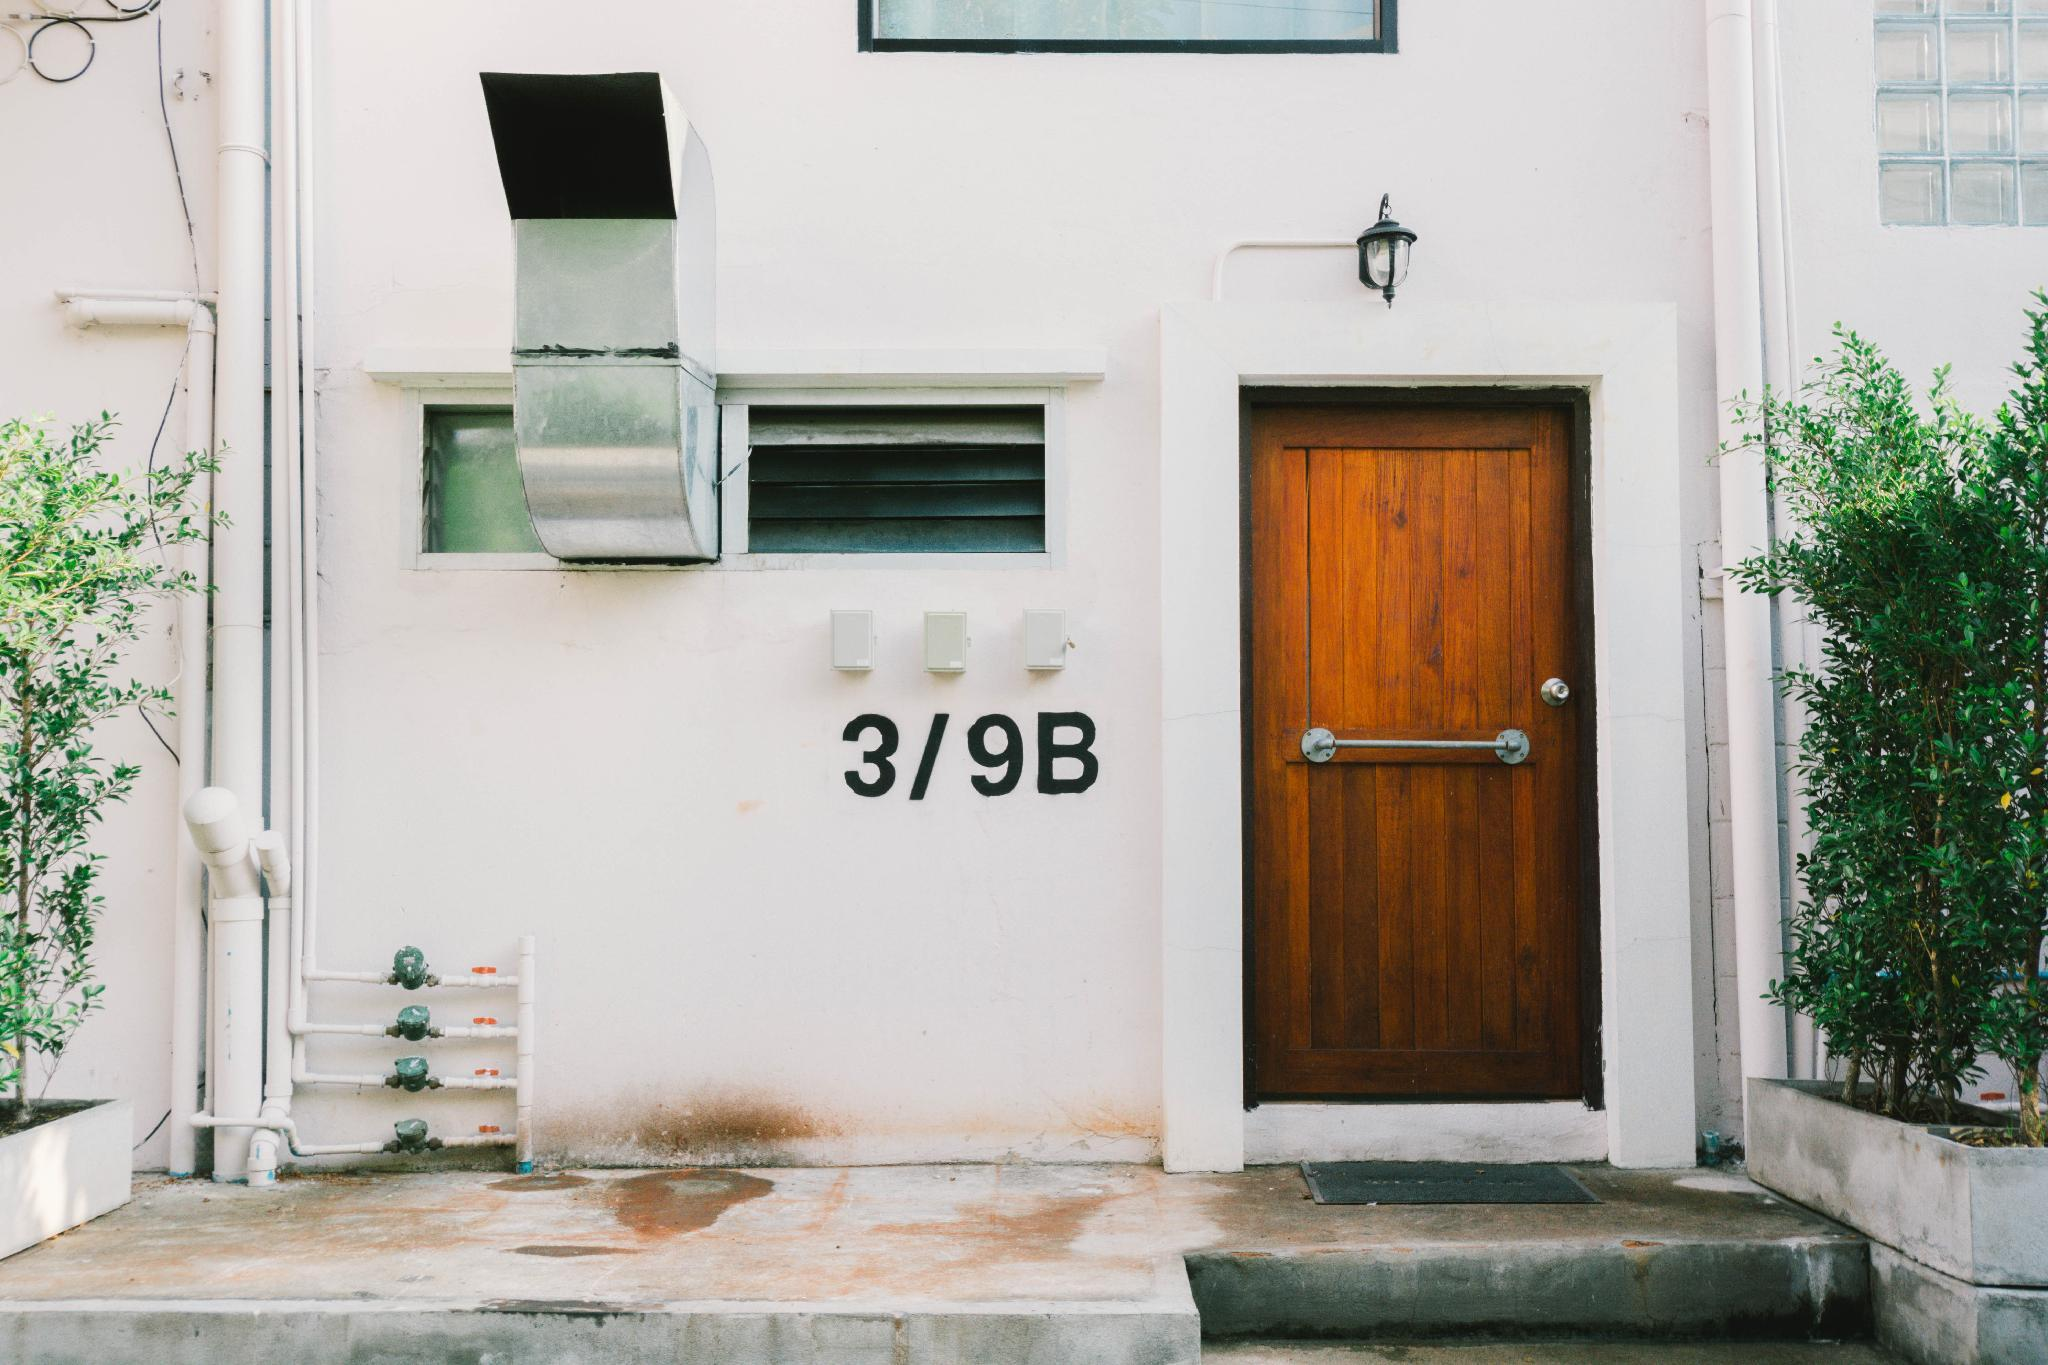 3/9B Stylish 4 BDRS+ 4 Baths old town Chiangmai อพาร์ตเมนต์ 4 ห้องนอน 4 ห้องน้ำส่วนตัว ขนาด 160 ตร.ม. – วัวลาย